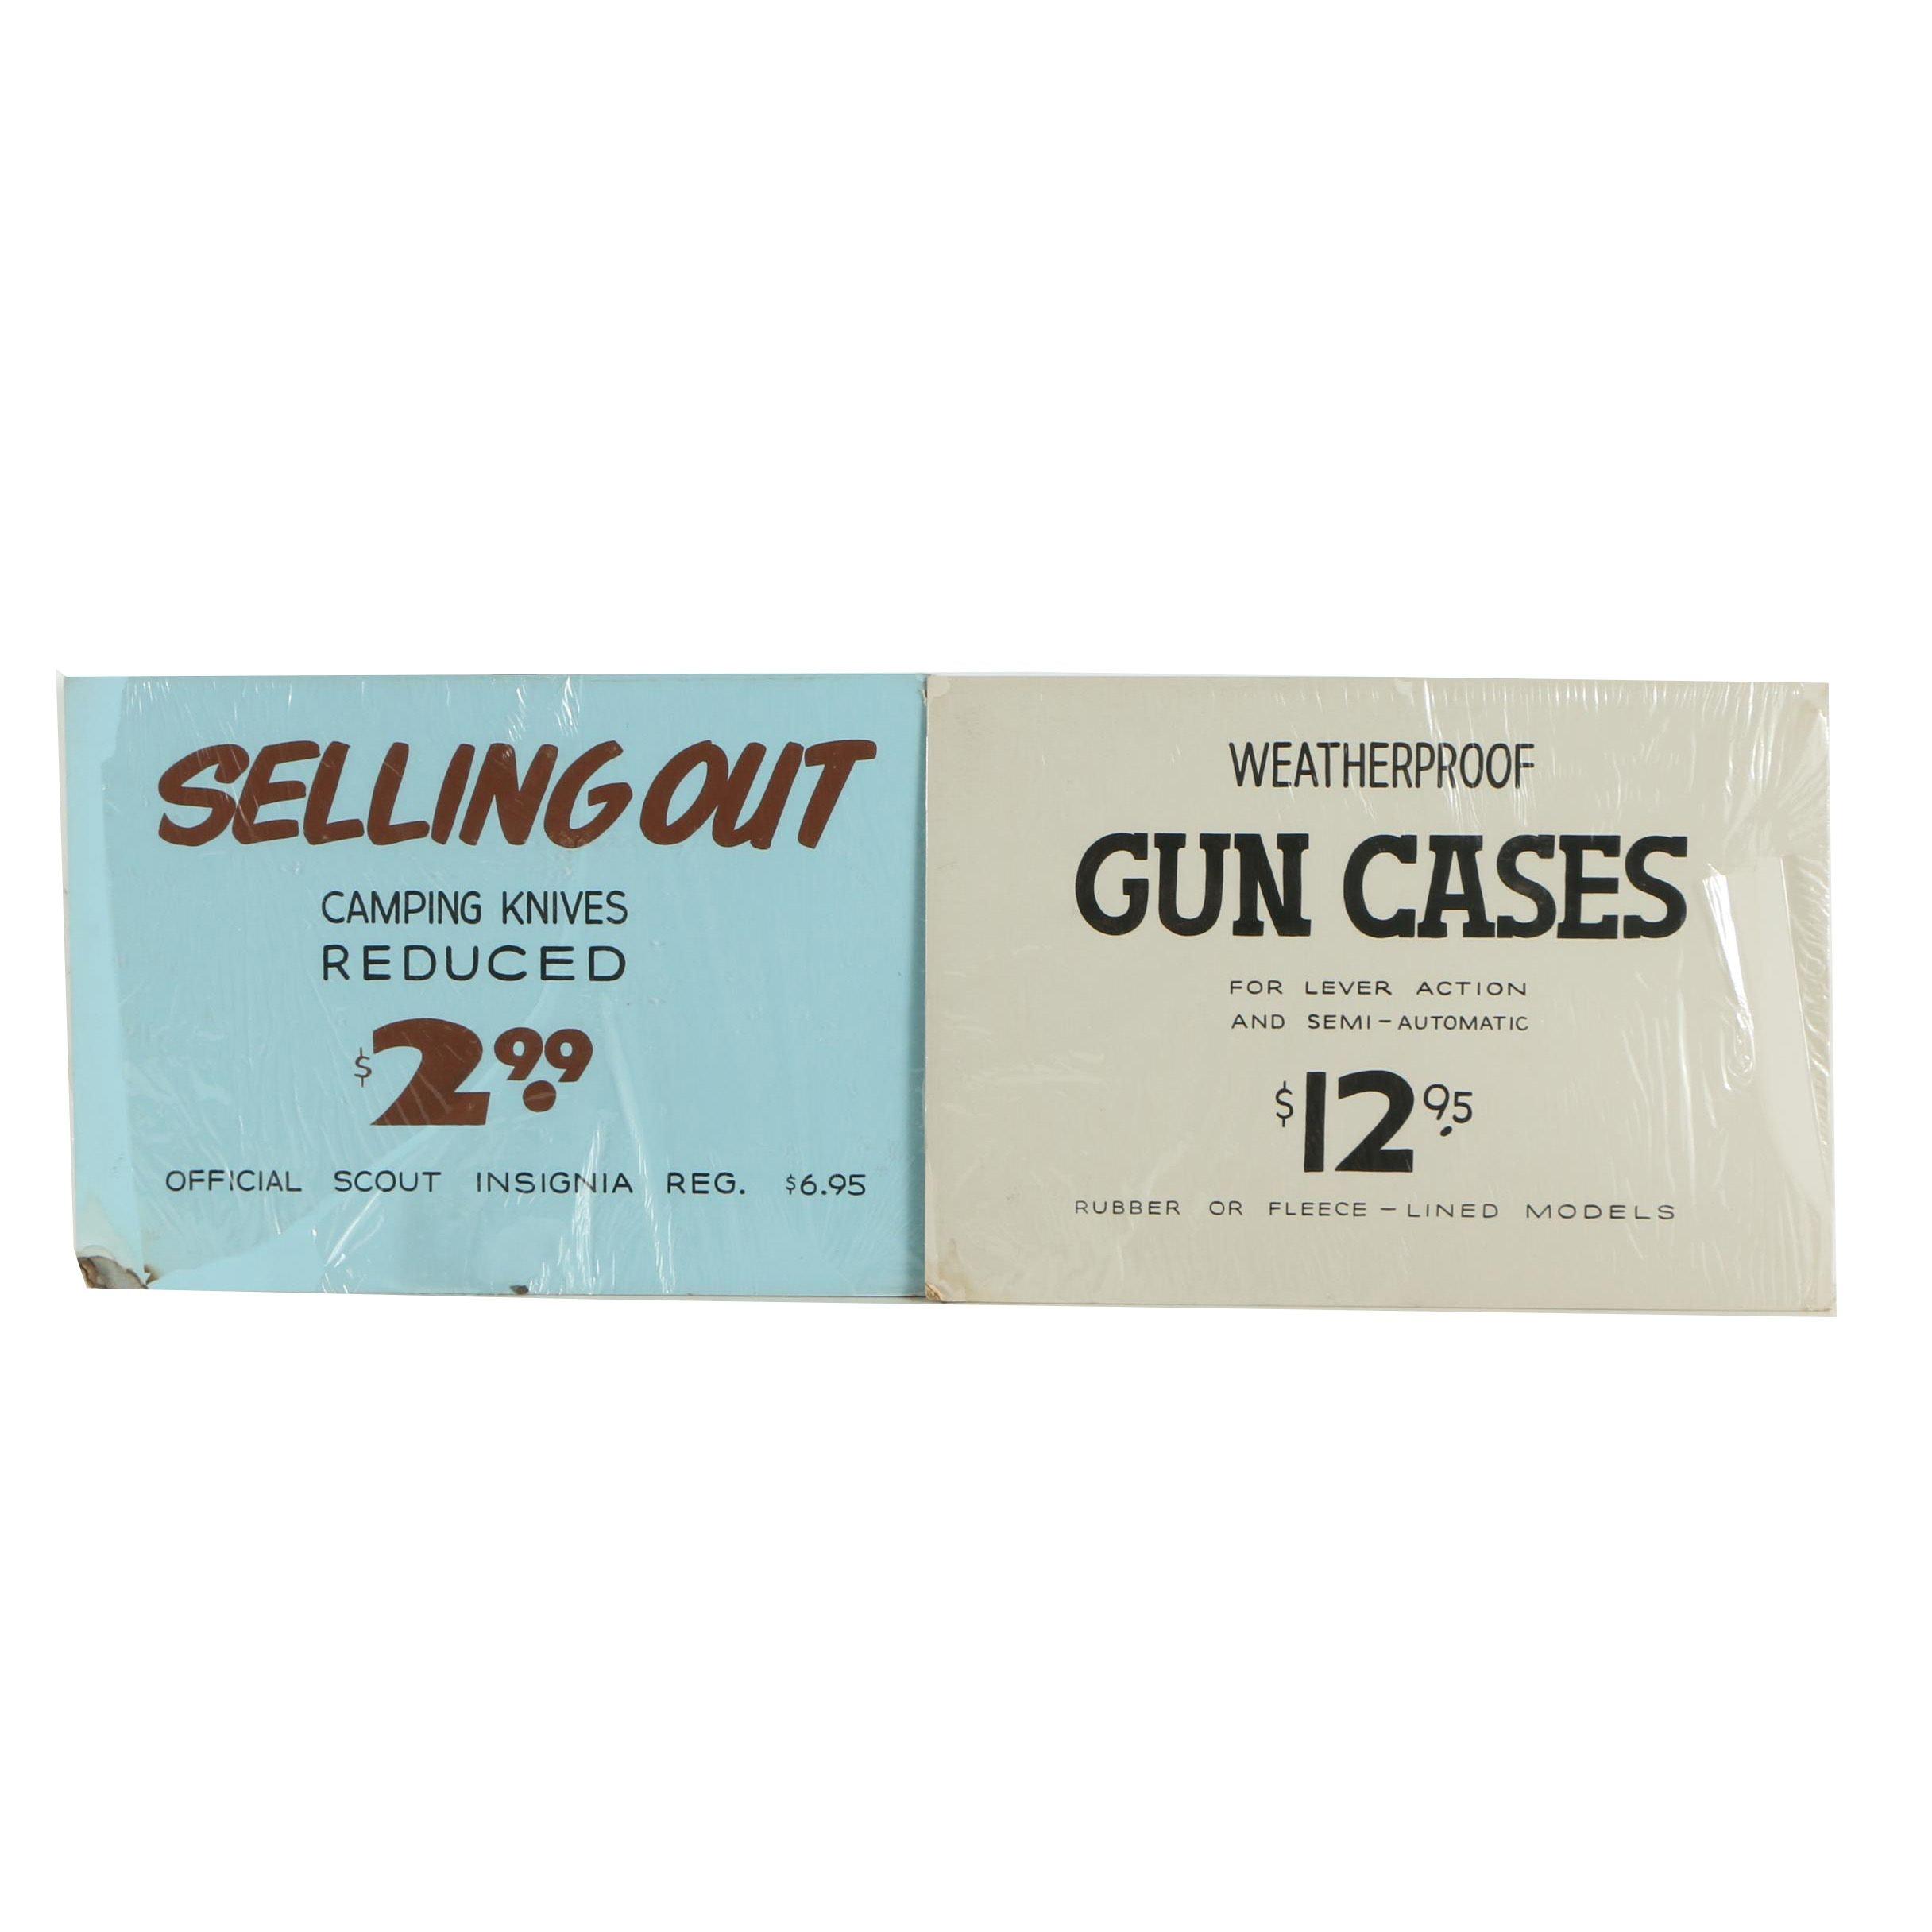 Vintage Handmade Gun Case and Knife Advertising Signs